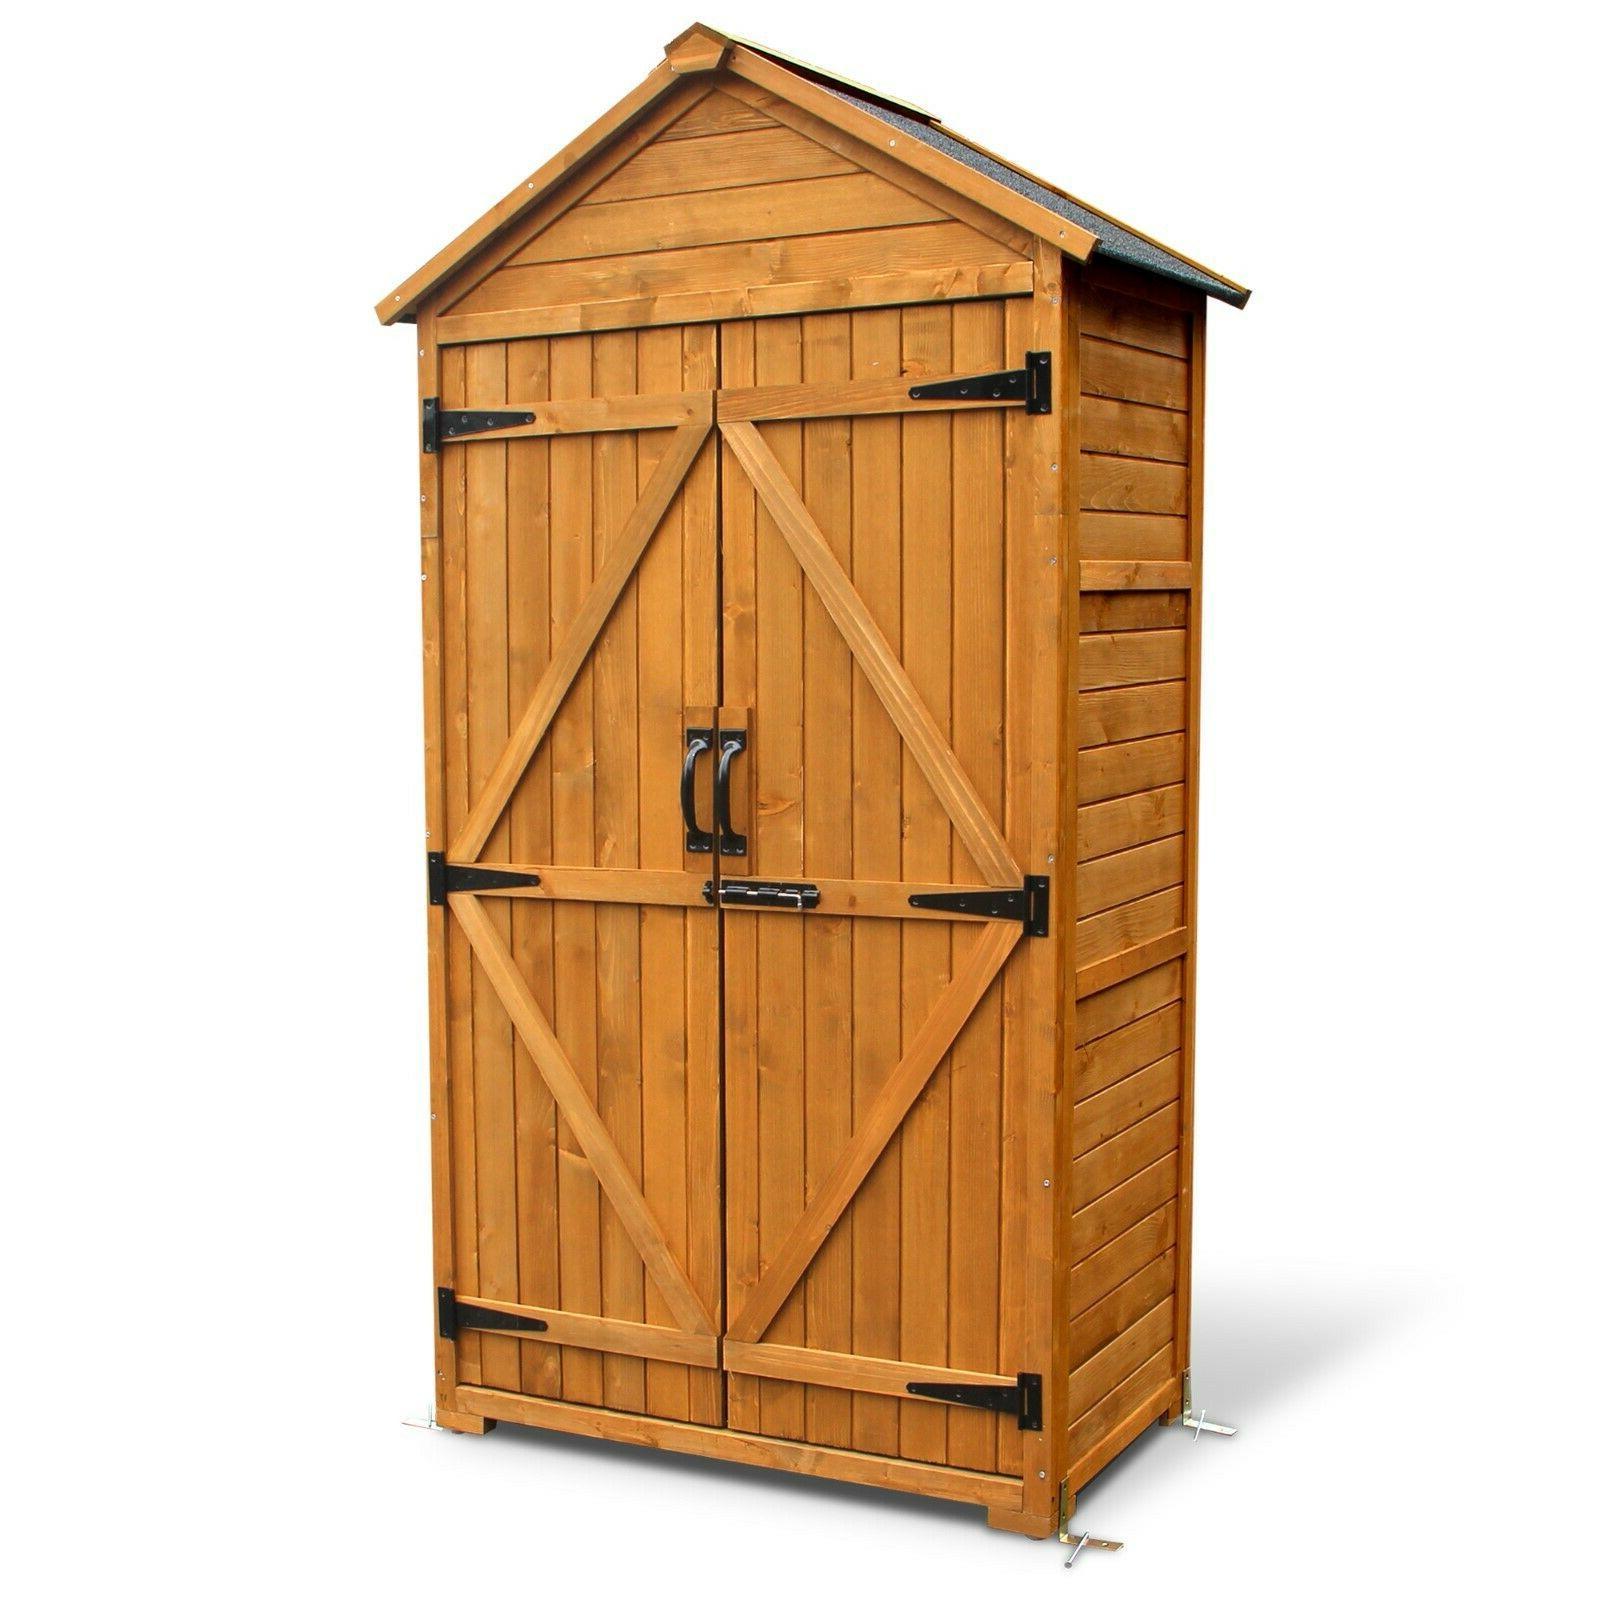 Mcombo Outdoor Storage Cabinet Tool